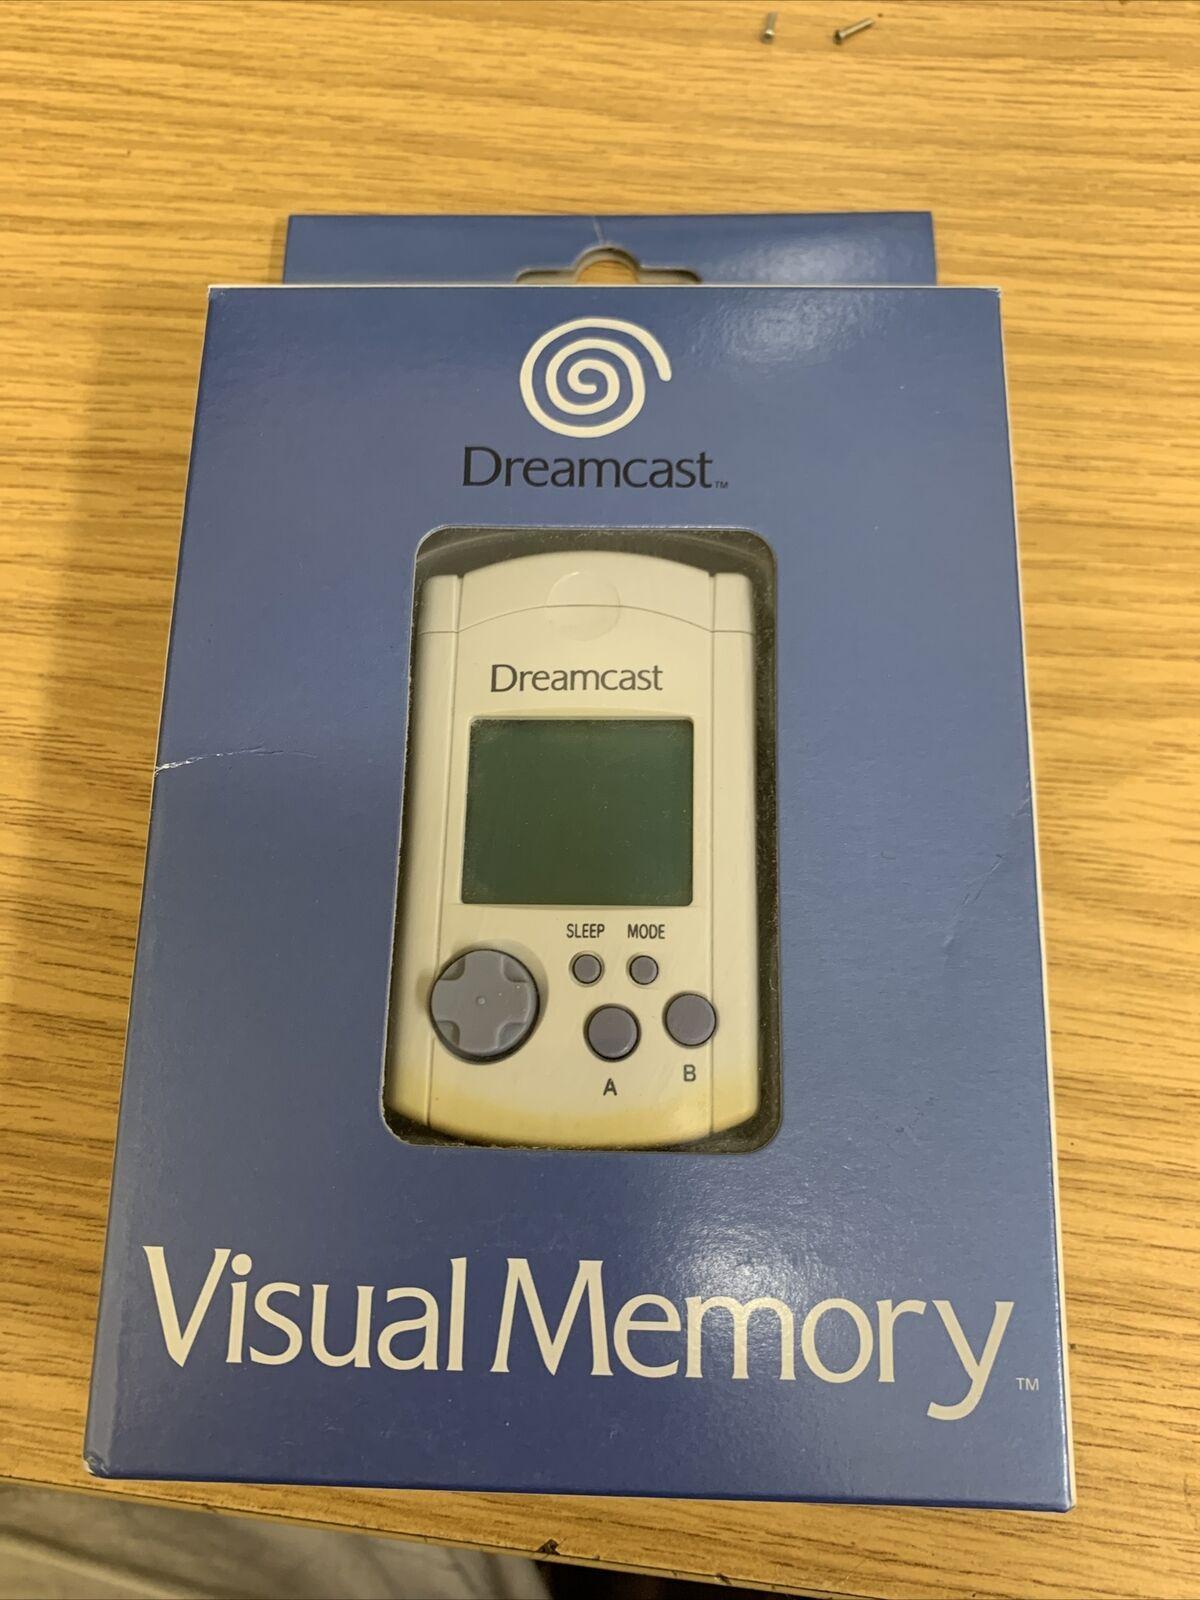 Dreamcast - Visual Memory Unit - boxed